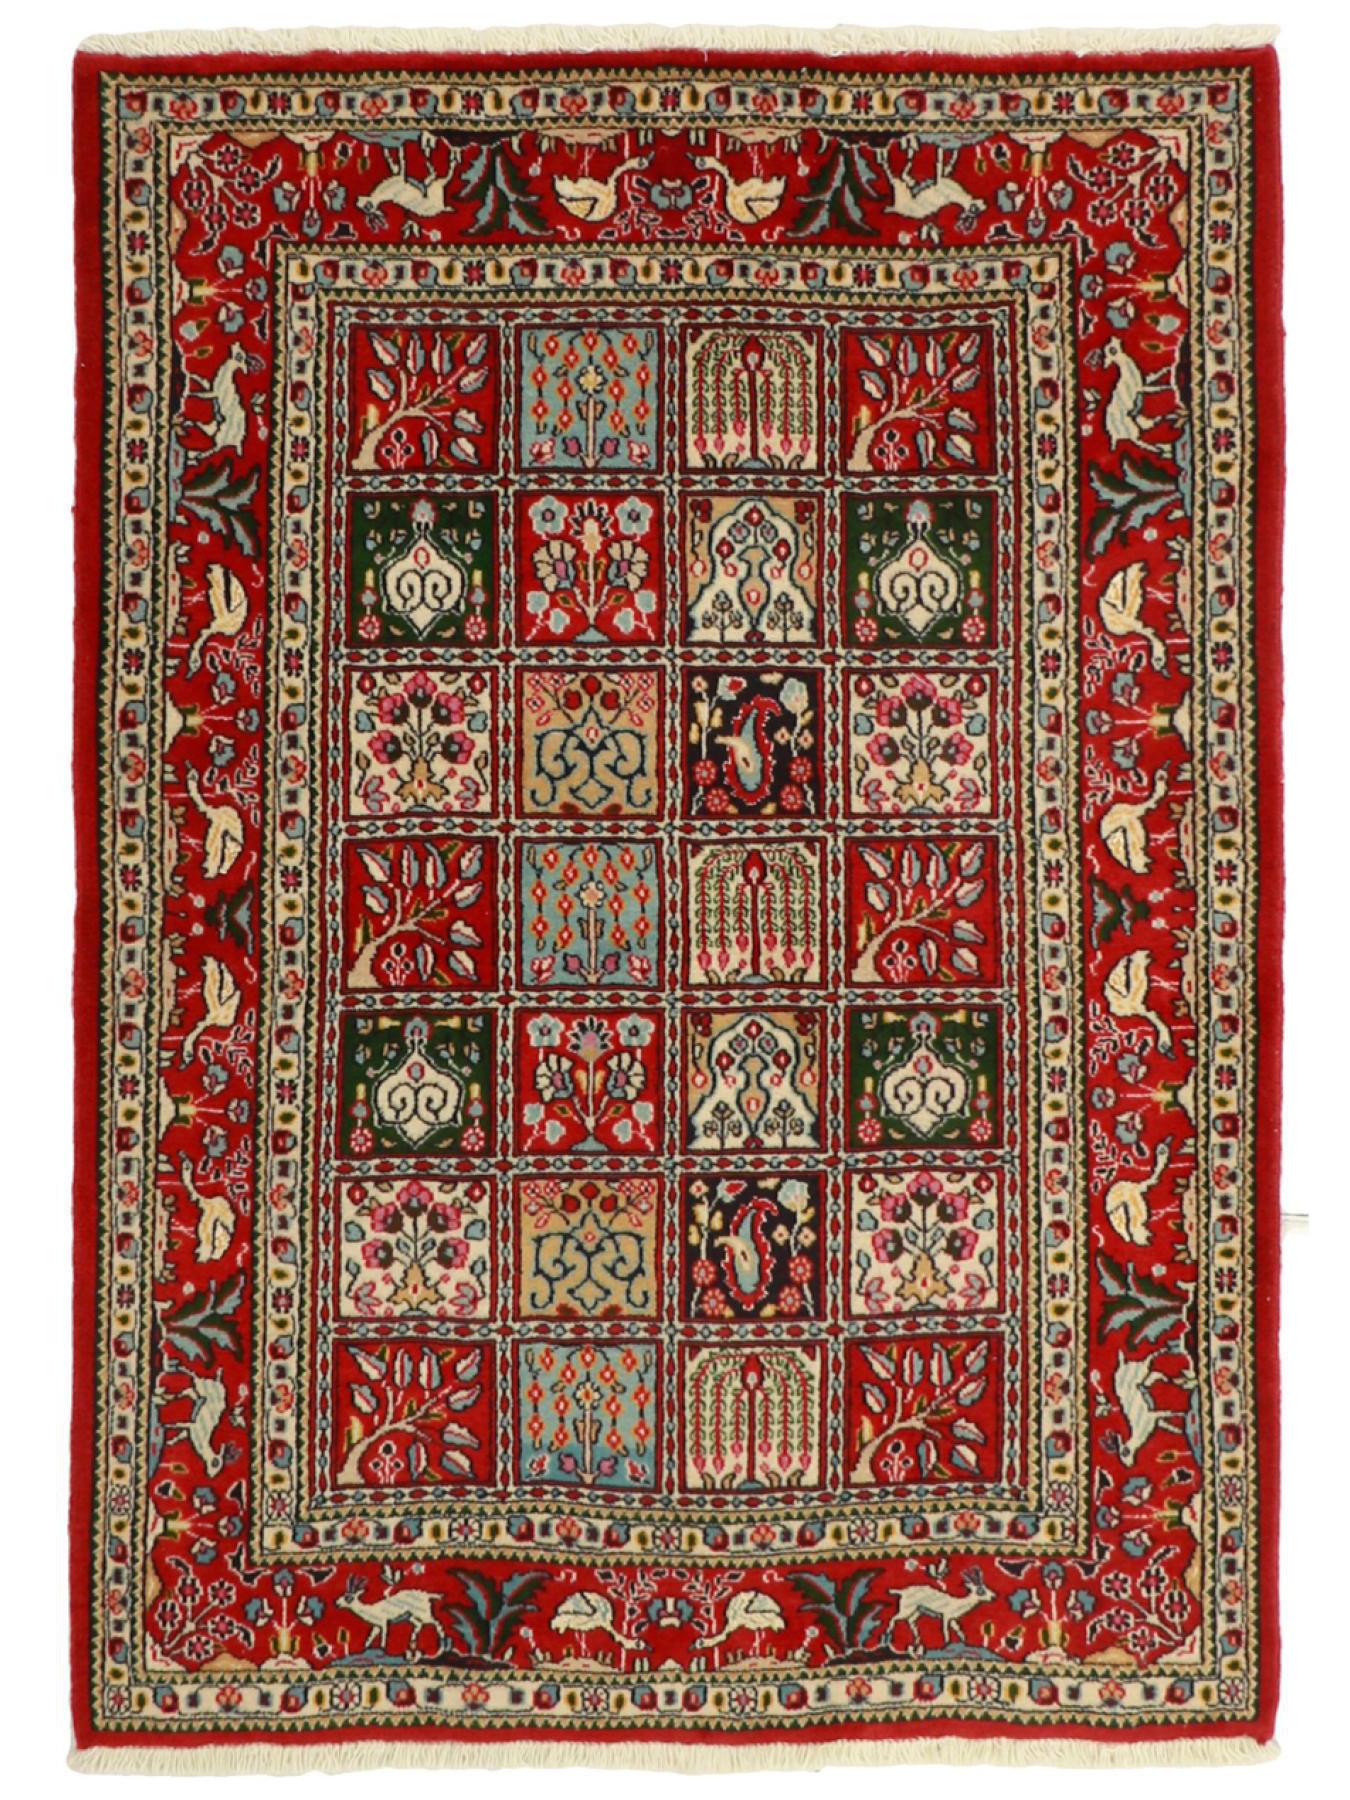 Tapis persans - Moud Jardin